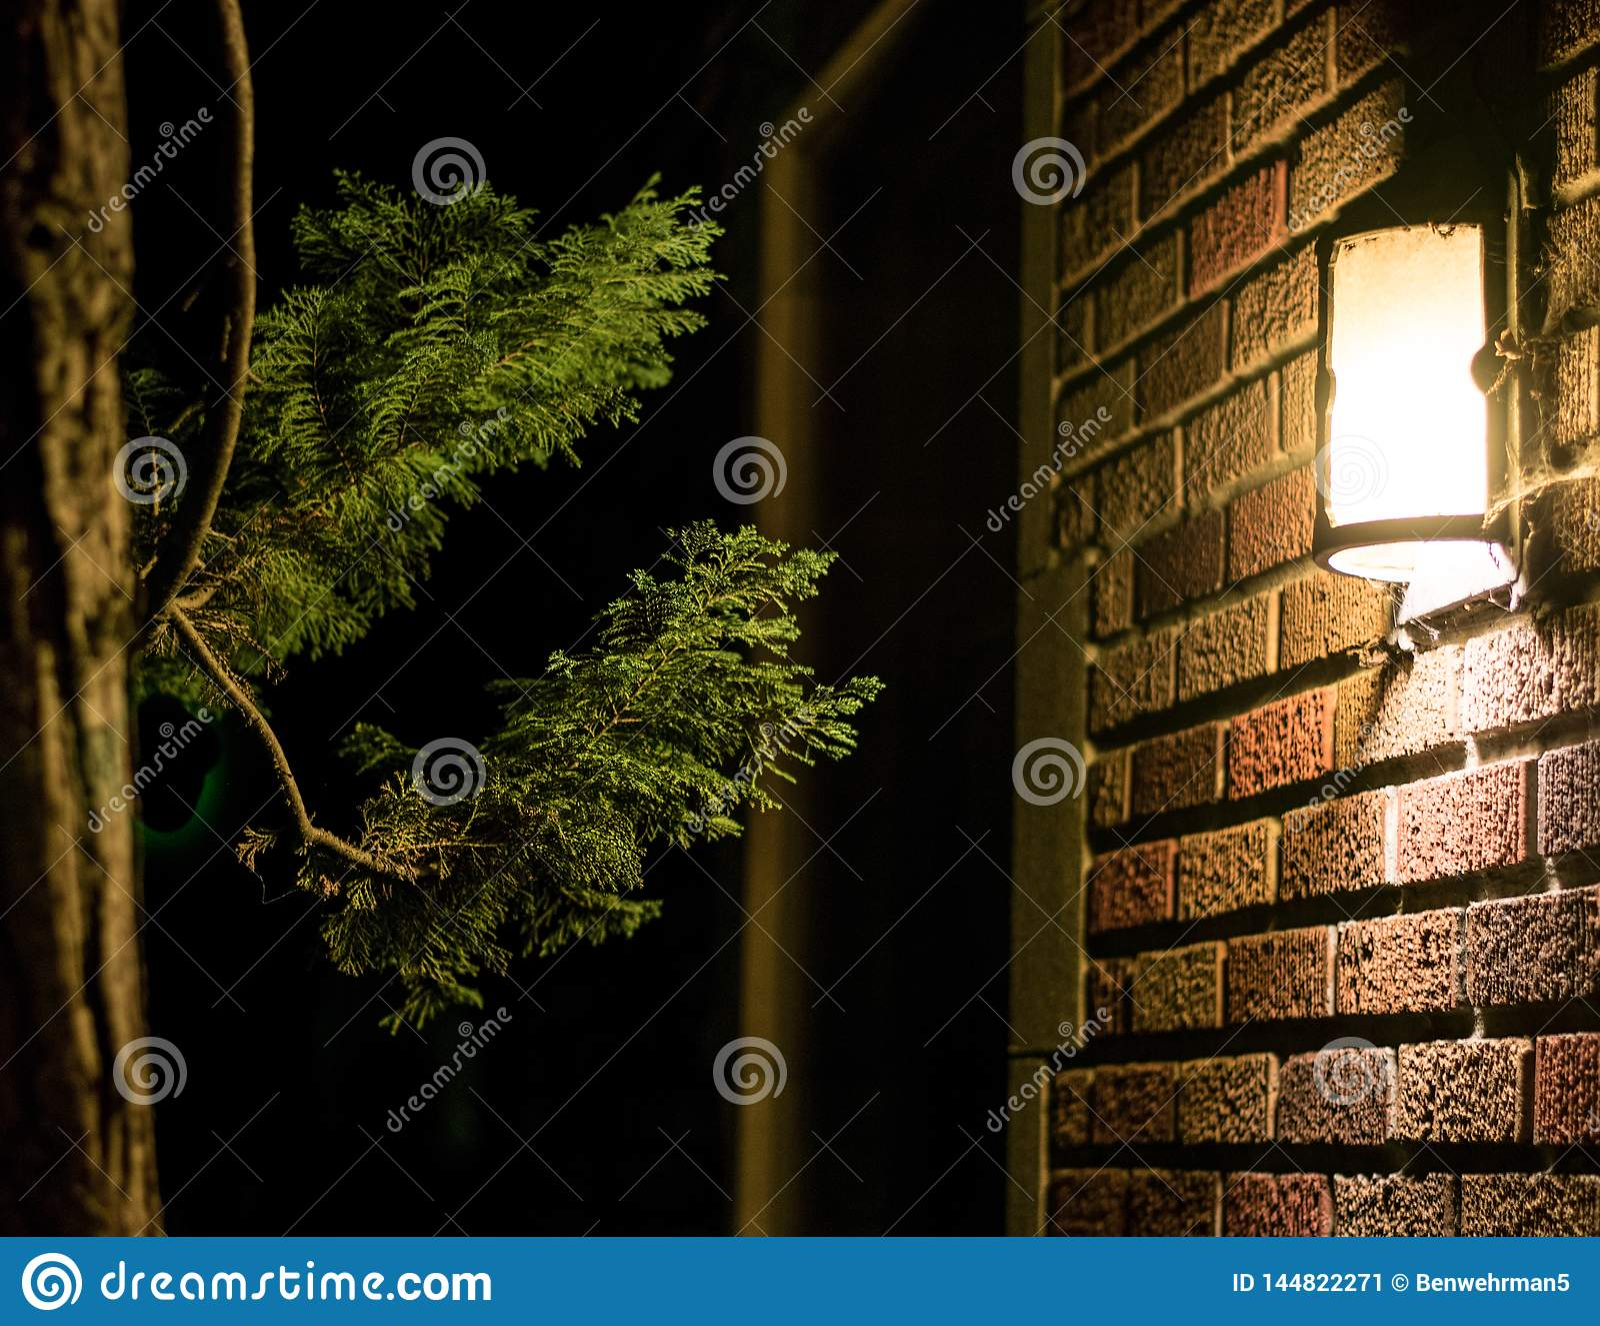 Свет и дерево на кирпичной стене